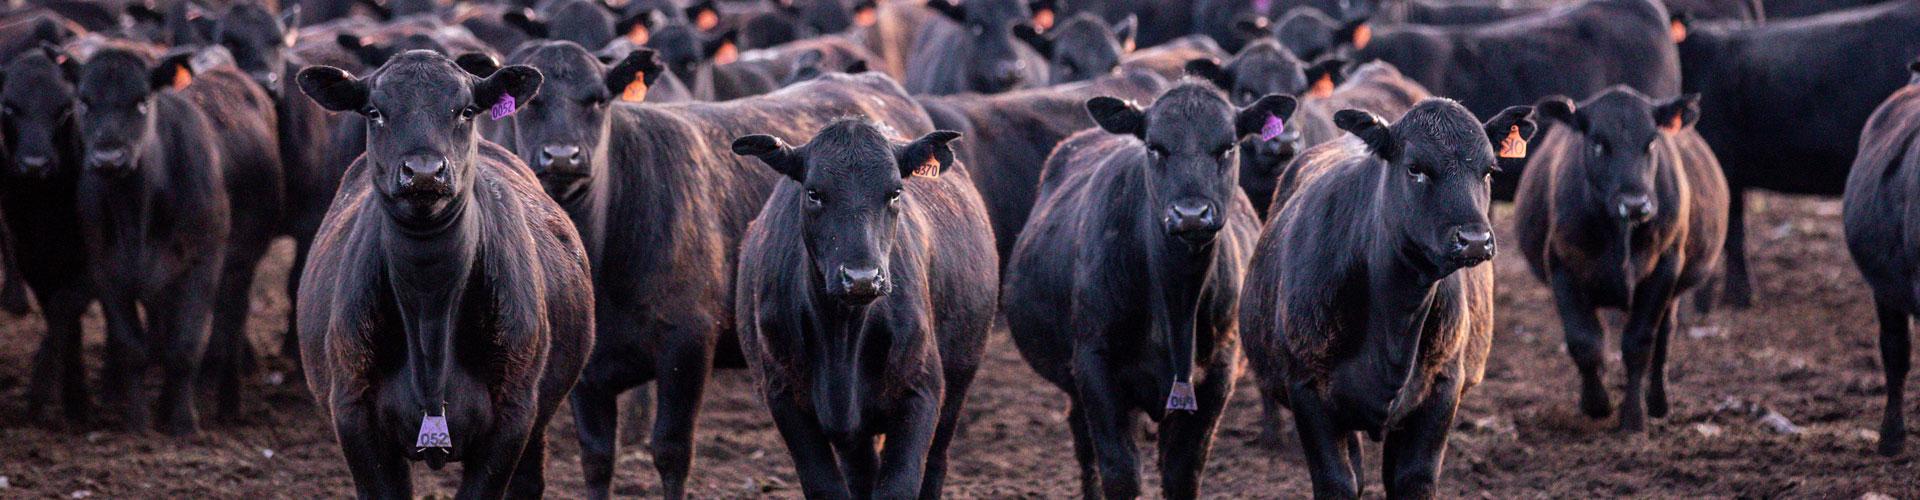 Rutan stocker calves